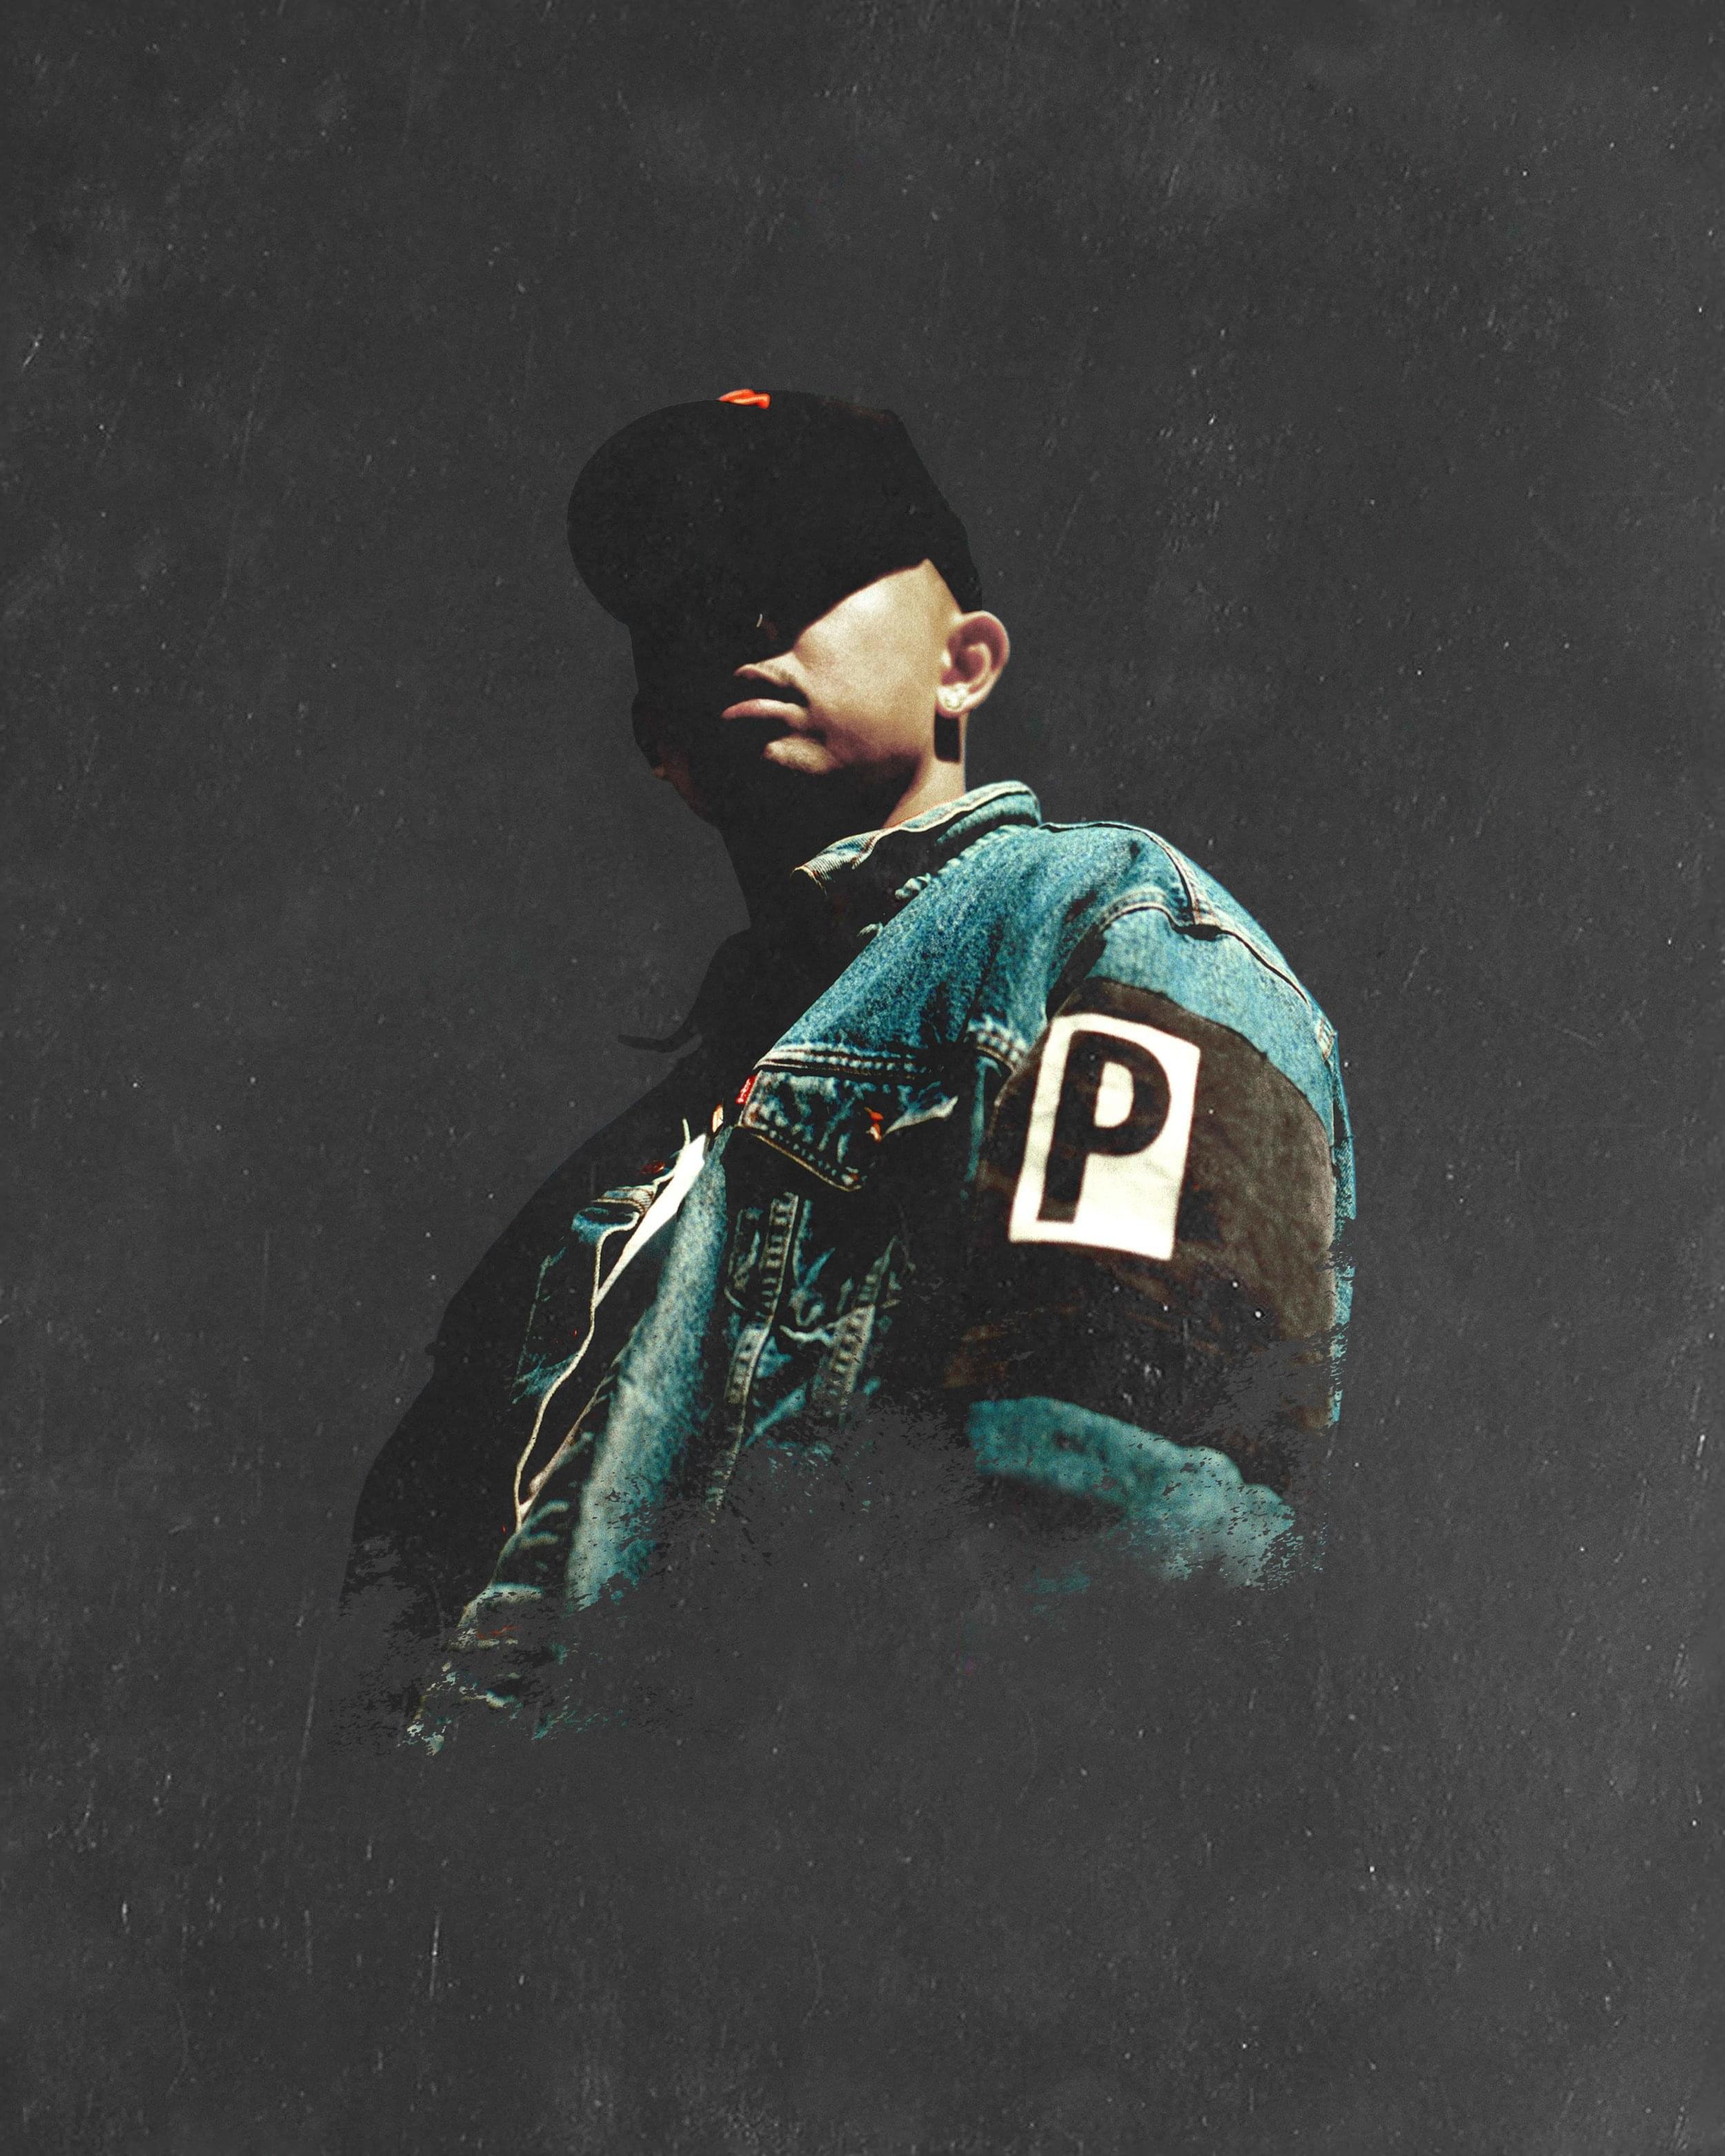 P-LO: Prime Tour